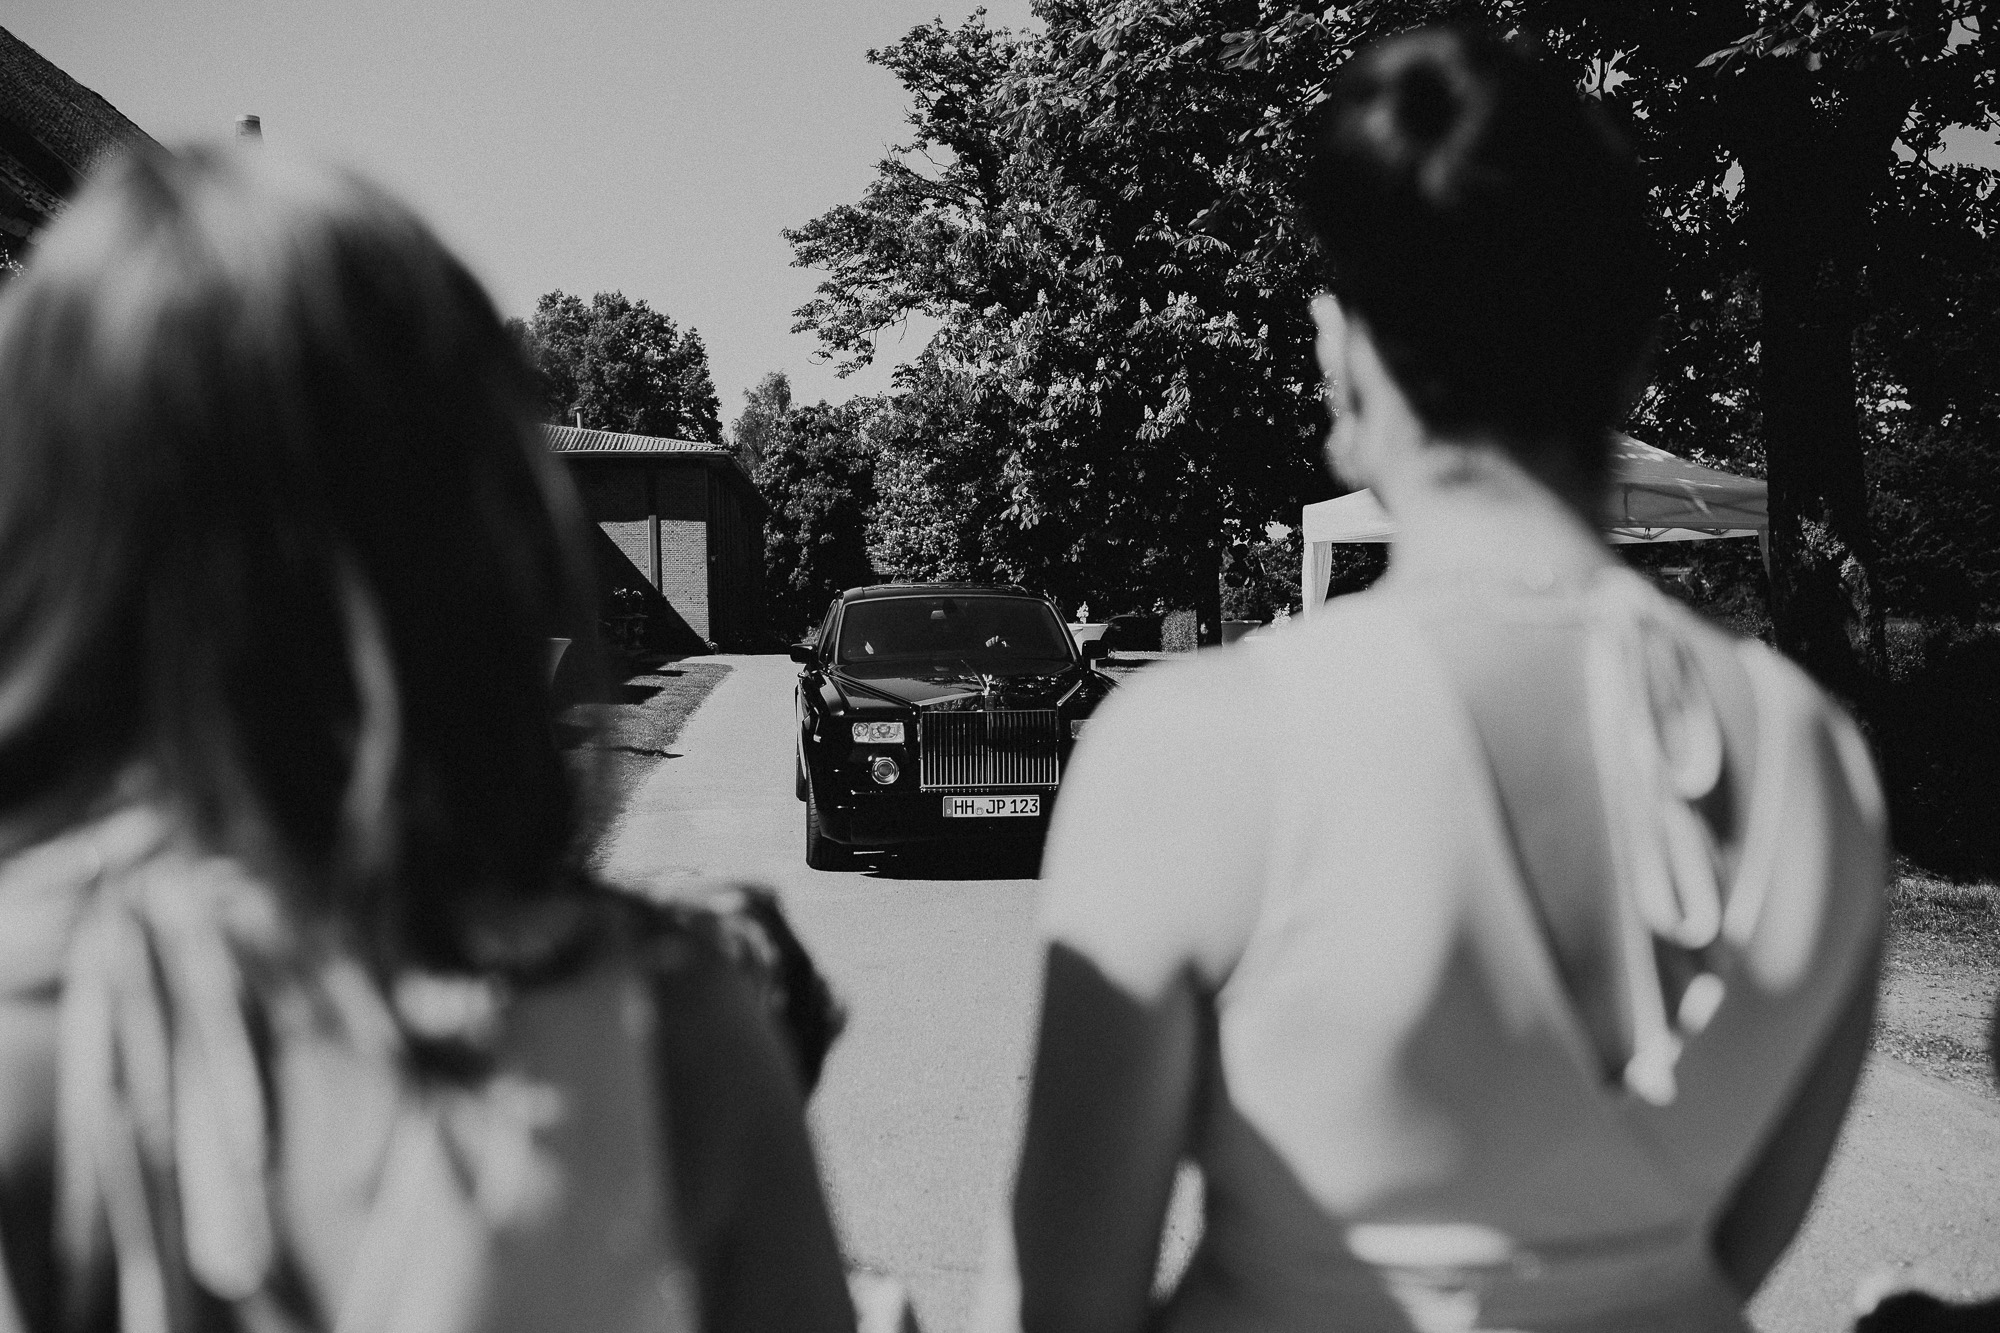 DanielaMarquardtPhotography_Hochzeitsfotograf_Düsseldorf_Köln_Mallorca_Bayern_Austria_Harz_Wedding_AileenundLennart_Weddingphotographer_Ibiza_Tuskany_Italien_Toskana_Portugal_Lissabon94